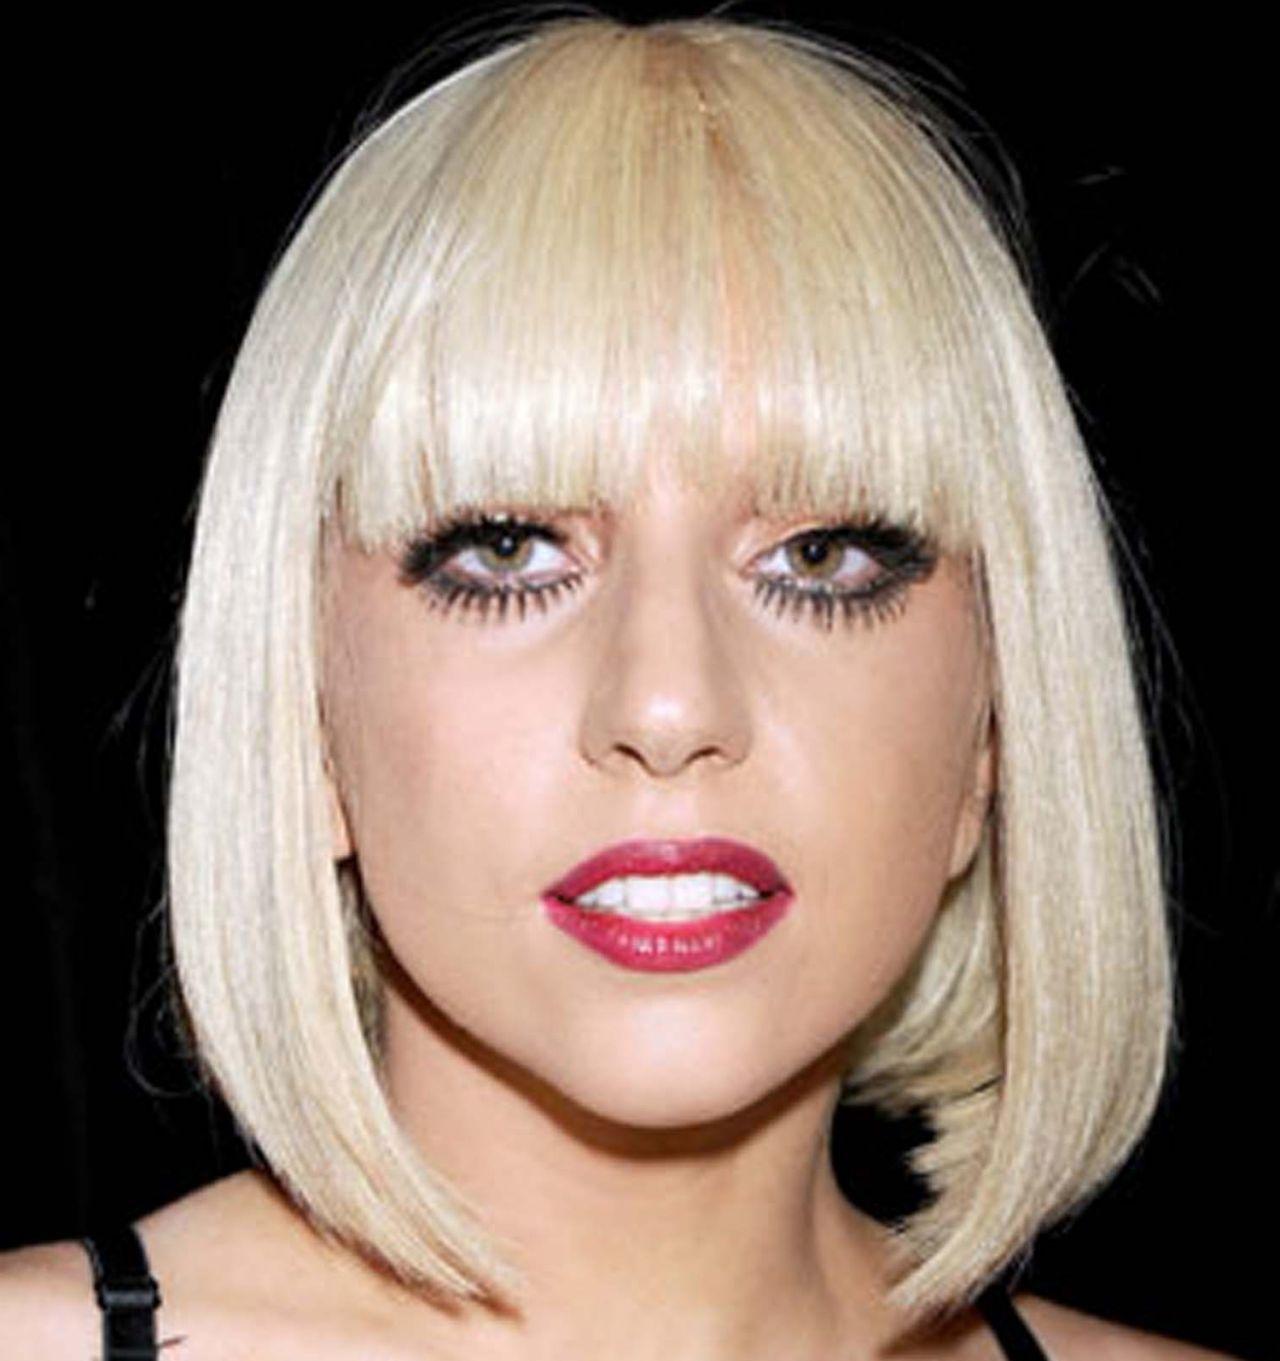 Lady Gaga Bangs Hairstyle Blonde Hair Color Straight Hair White Skin Red Lips Black Background Hairsty Platinum Blonde Hair Short Blonde Hair Real Human Hair